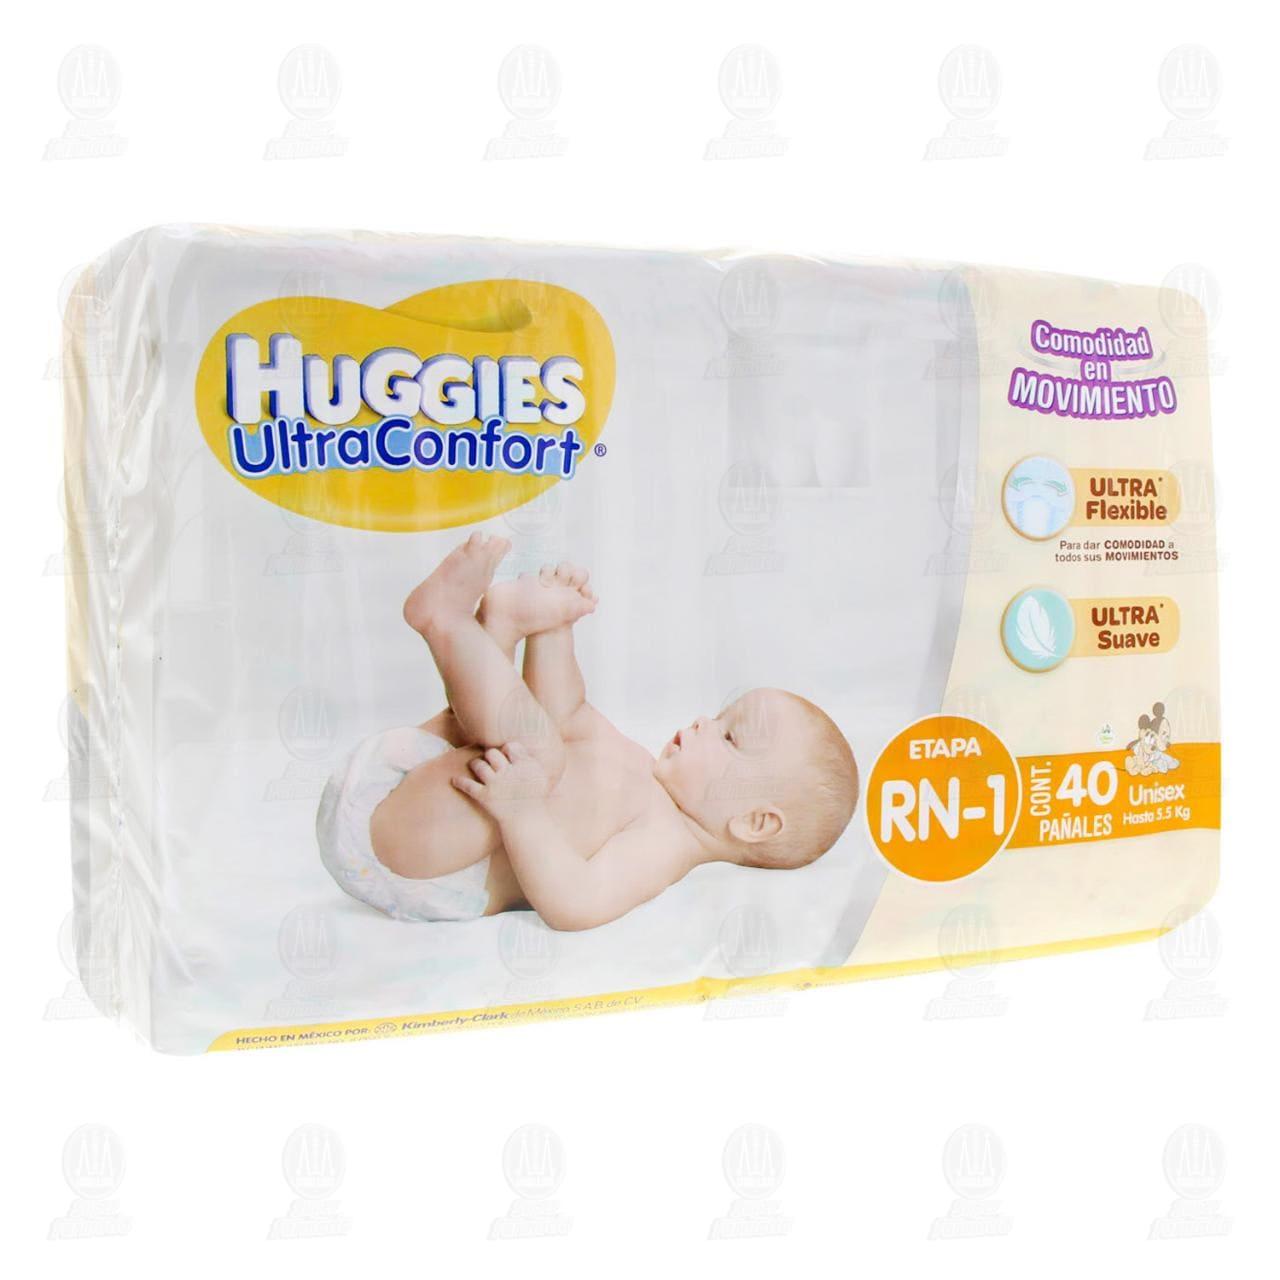 Comprar Pañales para Bebé Huggies UltraConfort Unisex Etapa RN, 40 pzas. en Farmacias Guadalajara